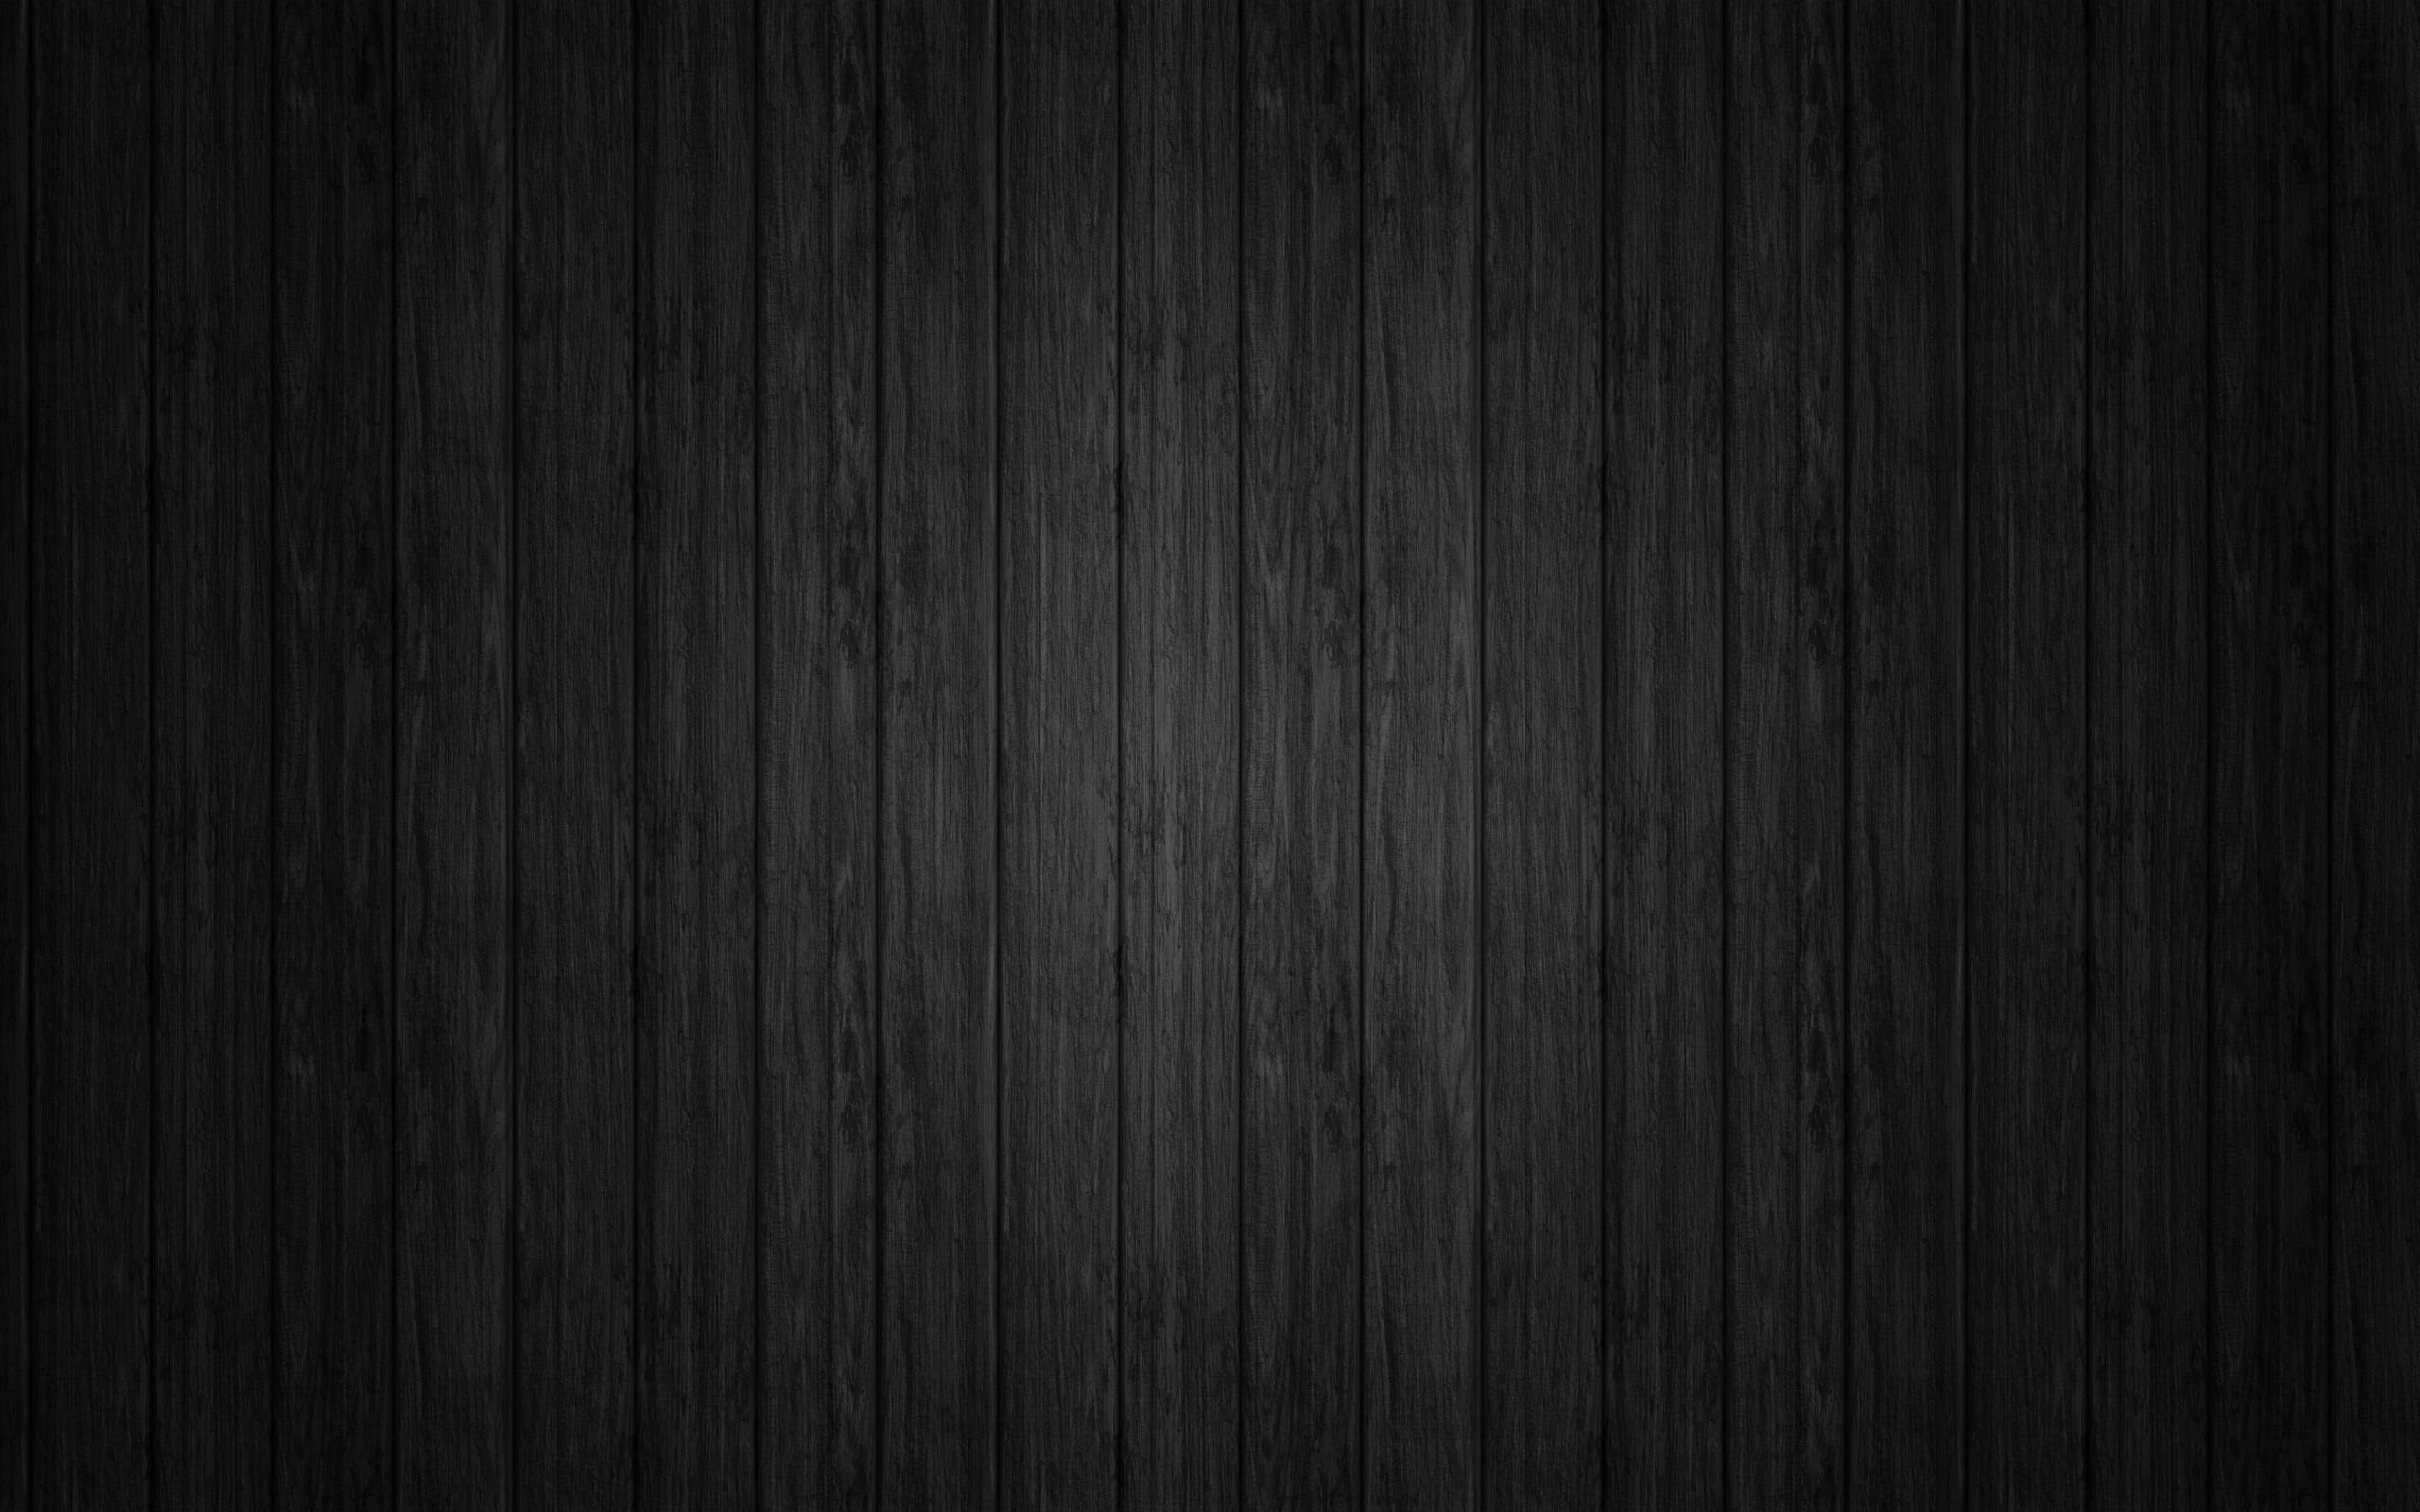 Black Background Wallpaper 2560x1600 Black Background Wood 2560x1600